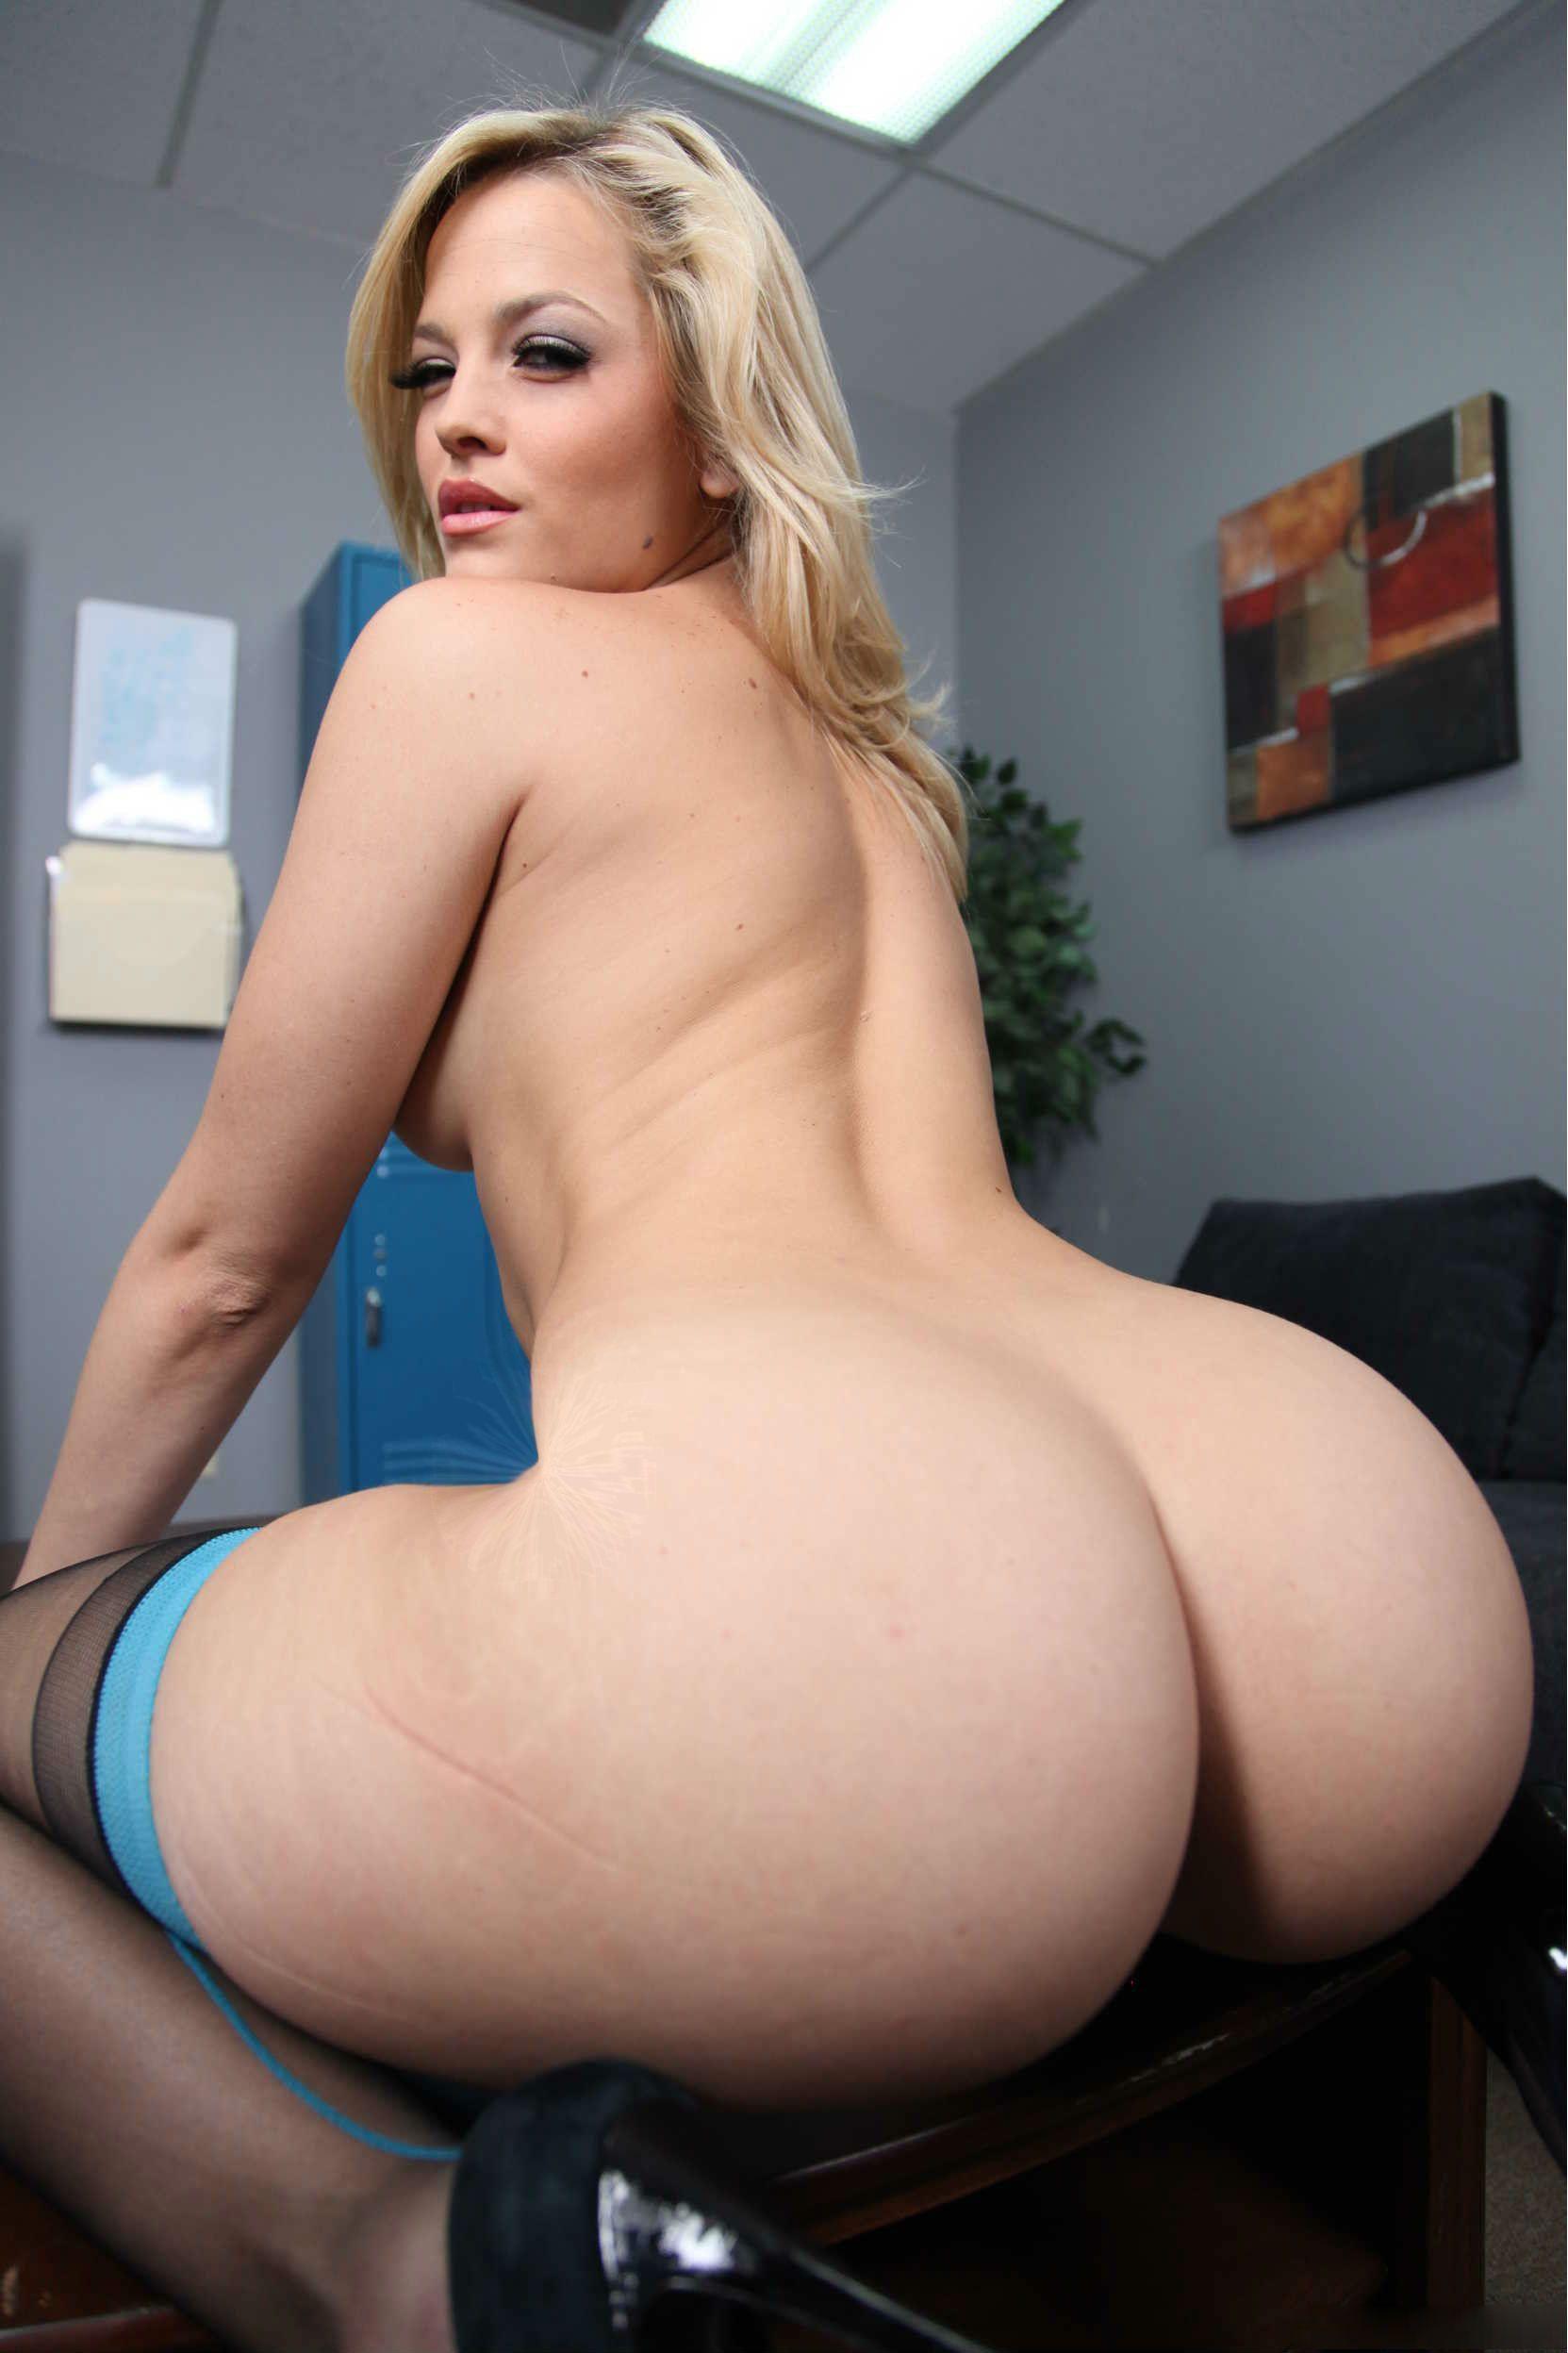 Tex nice ass and bush 4